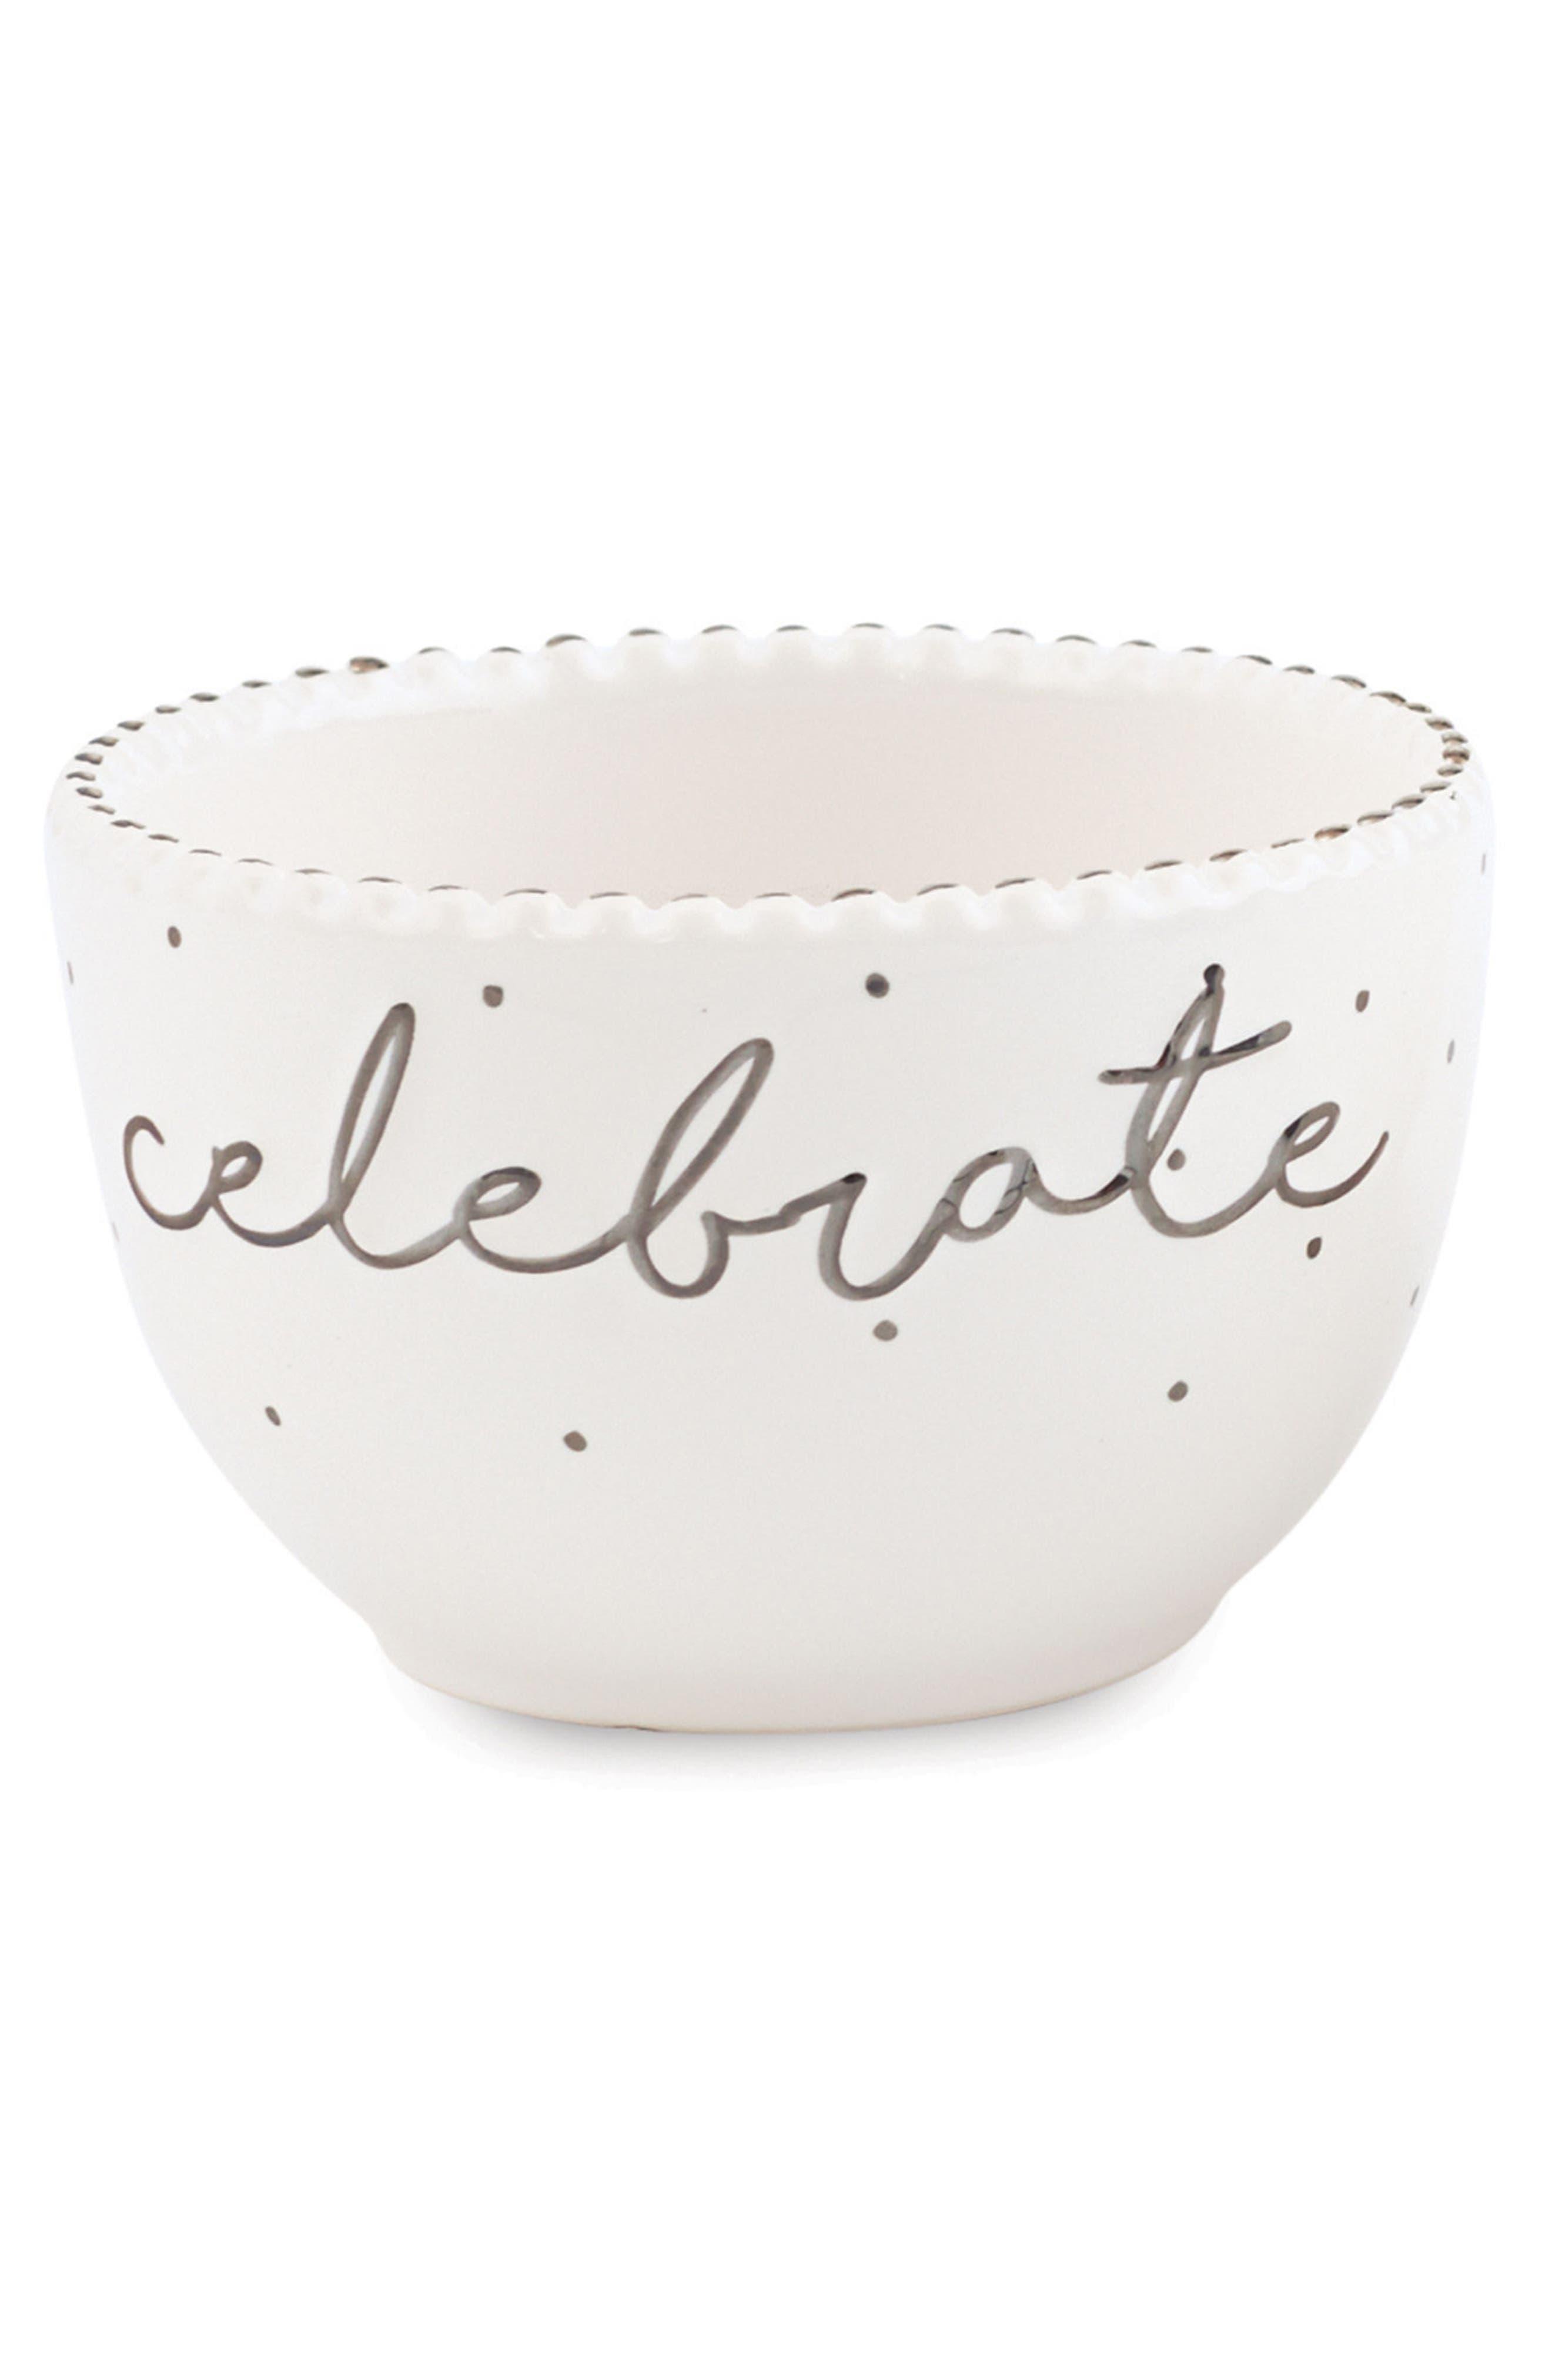 Celebrate Stoneware Dip Cup,                             Main thumbnail 1, color,                             100